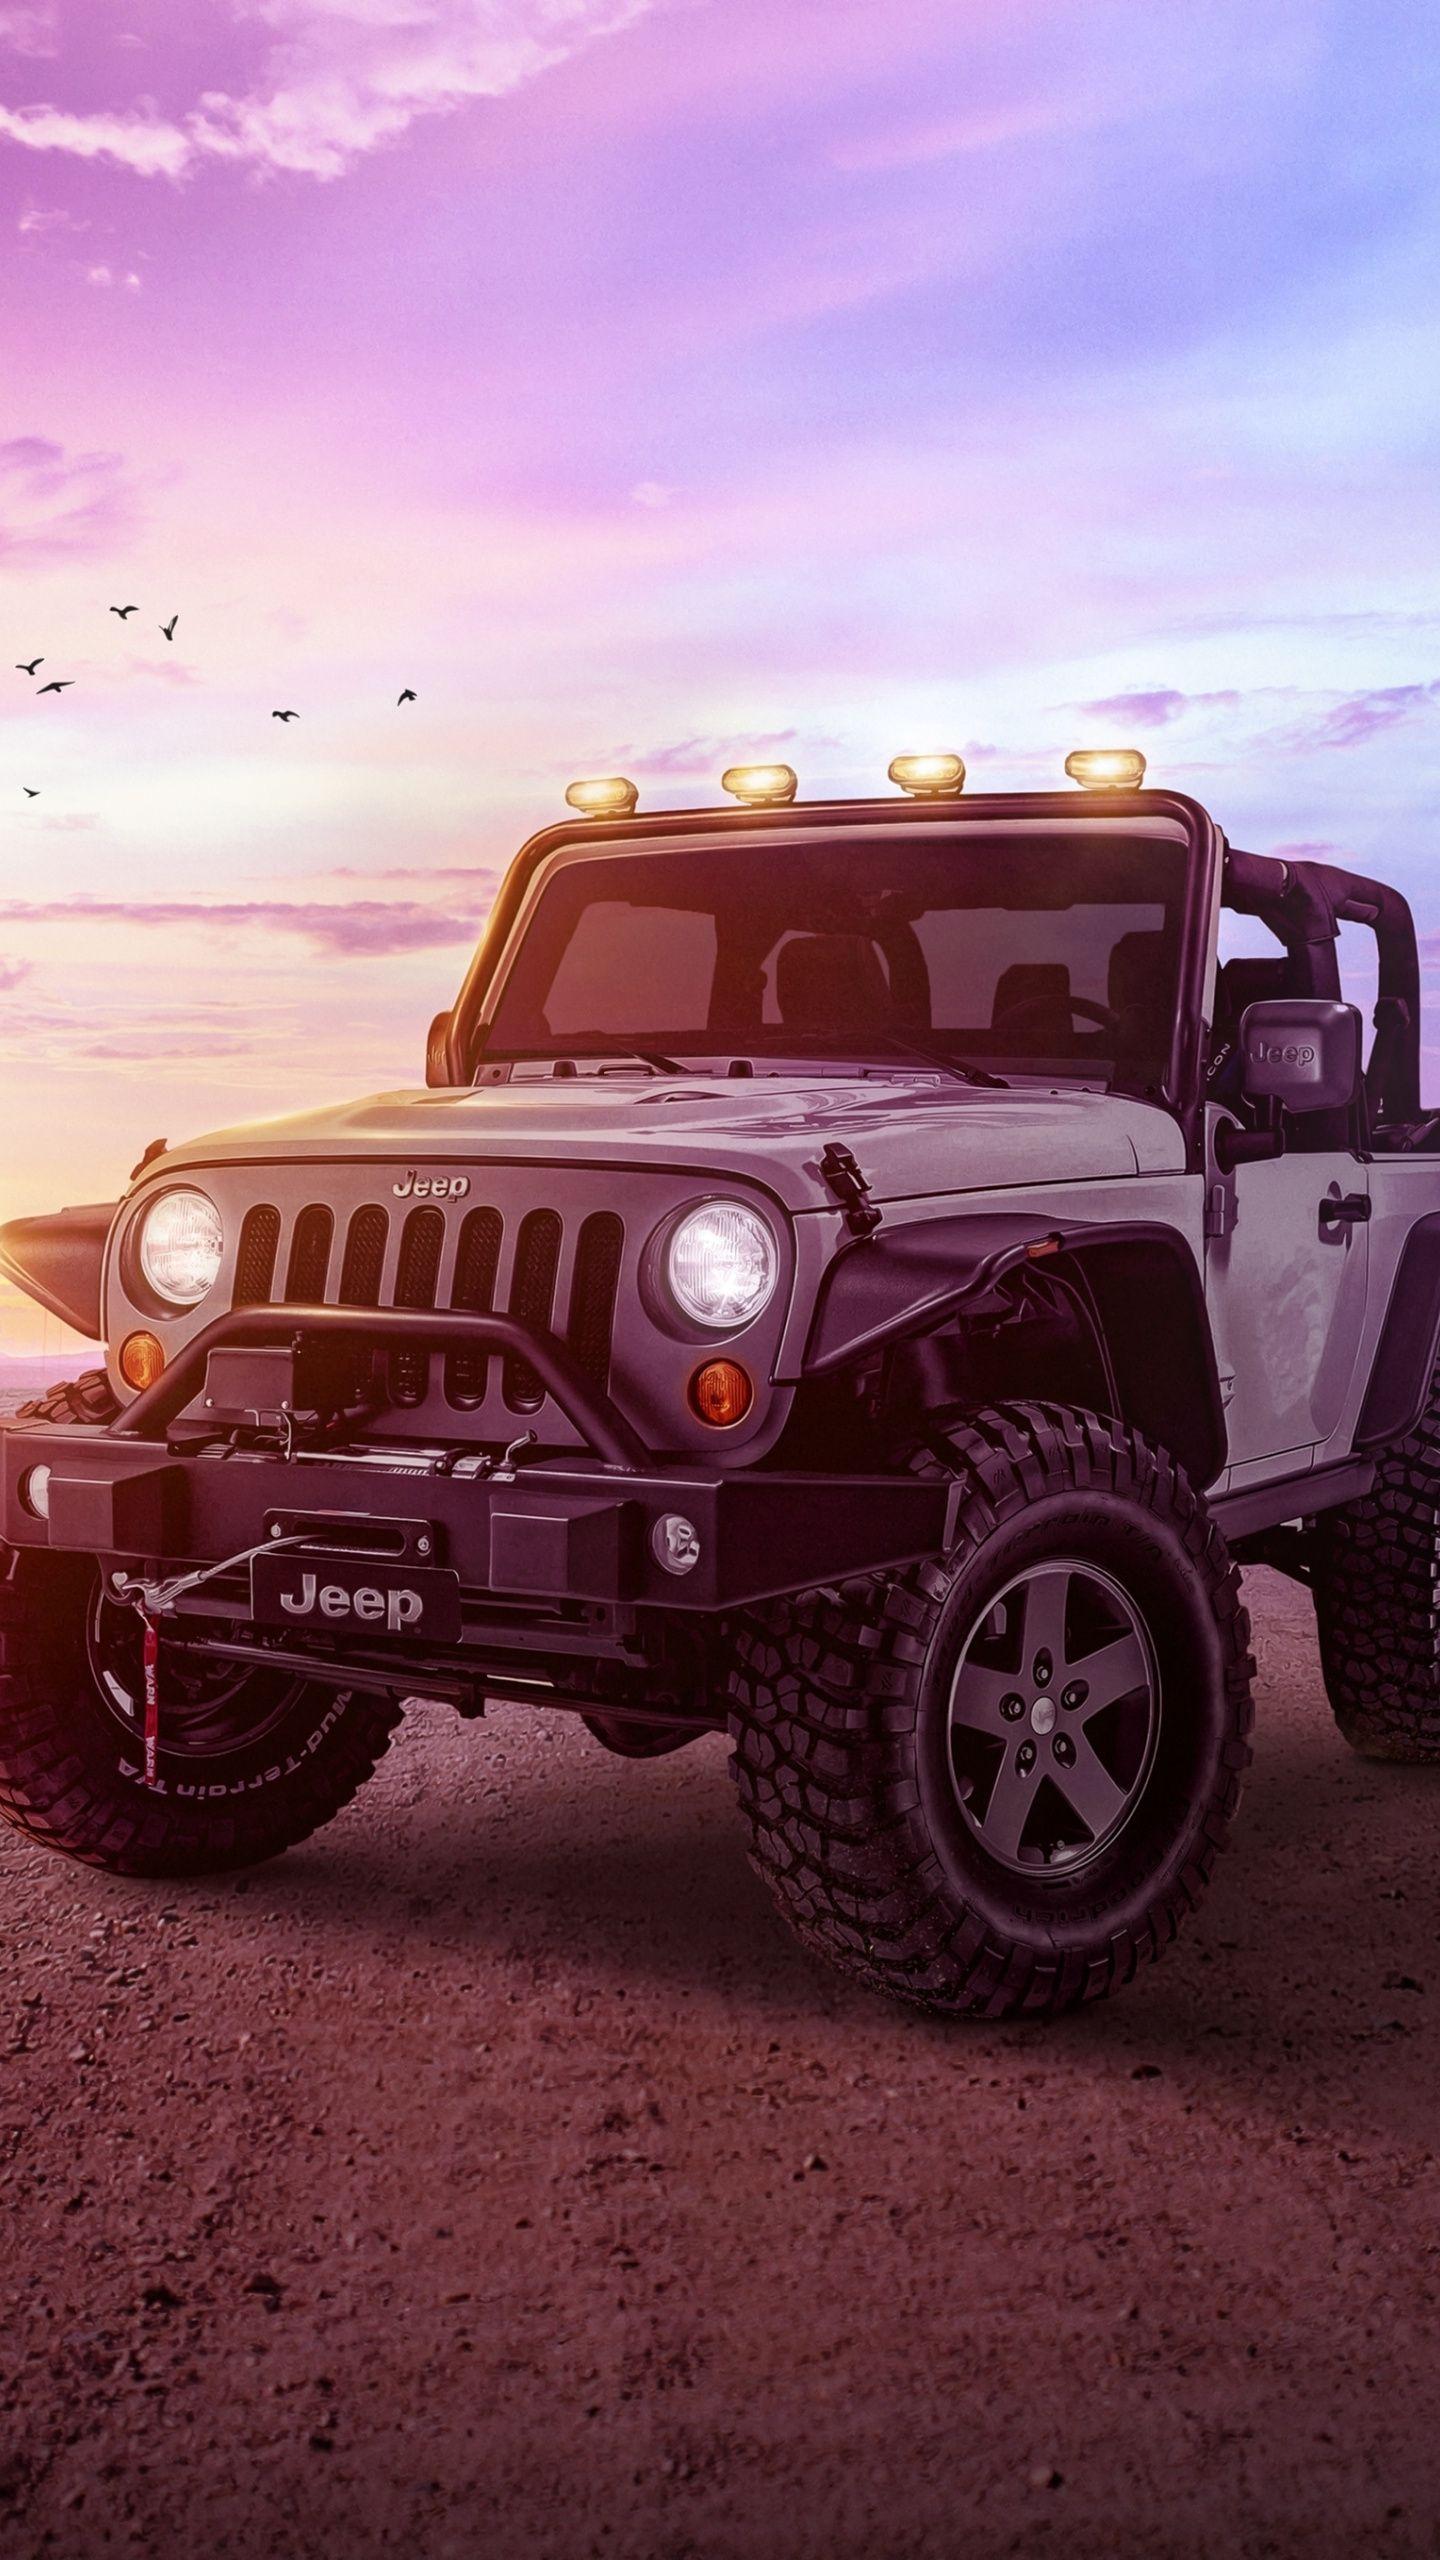 1440x2560 Jeep Wrangler Suv Car Wallpaper In 2021 Jeep Wrangler Car Wallpapers Jeep